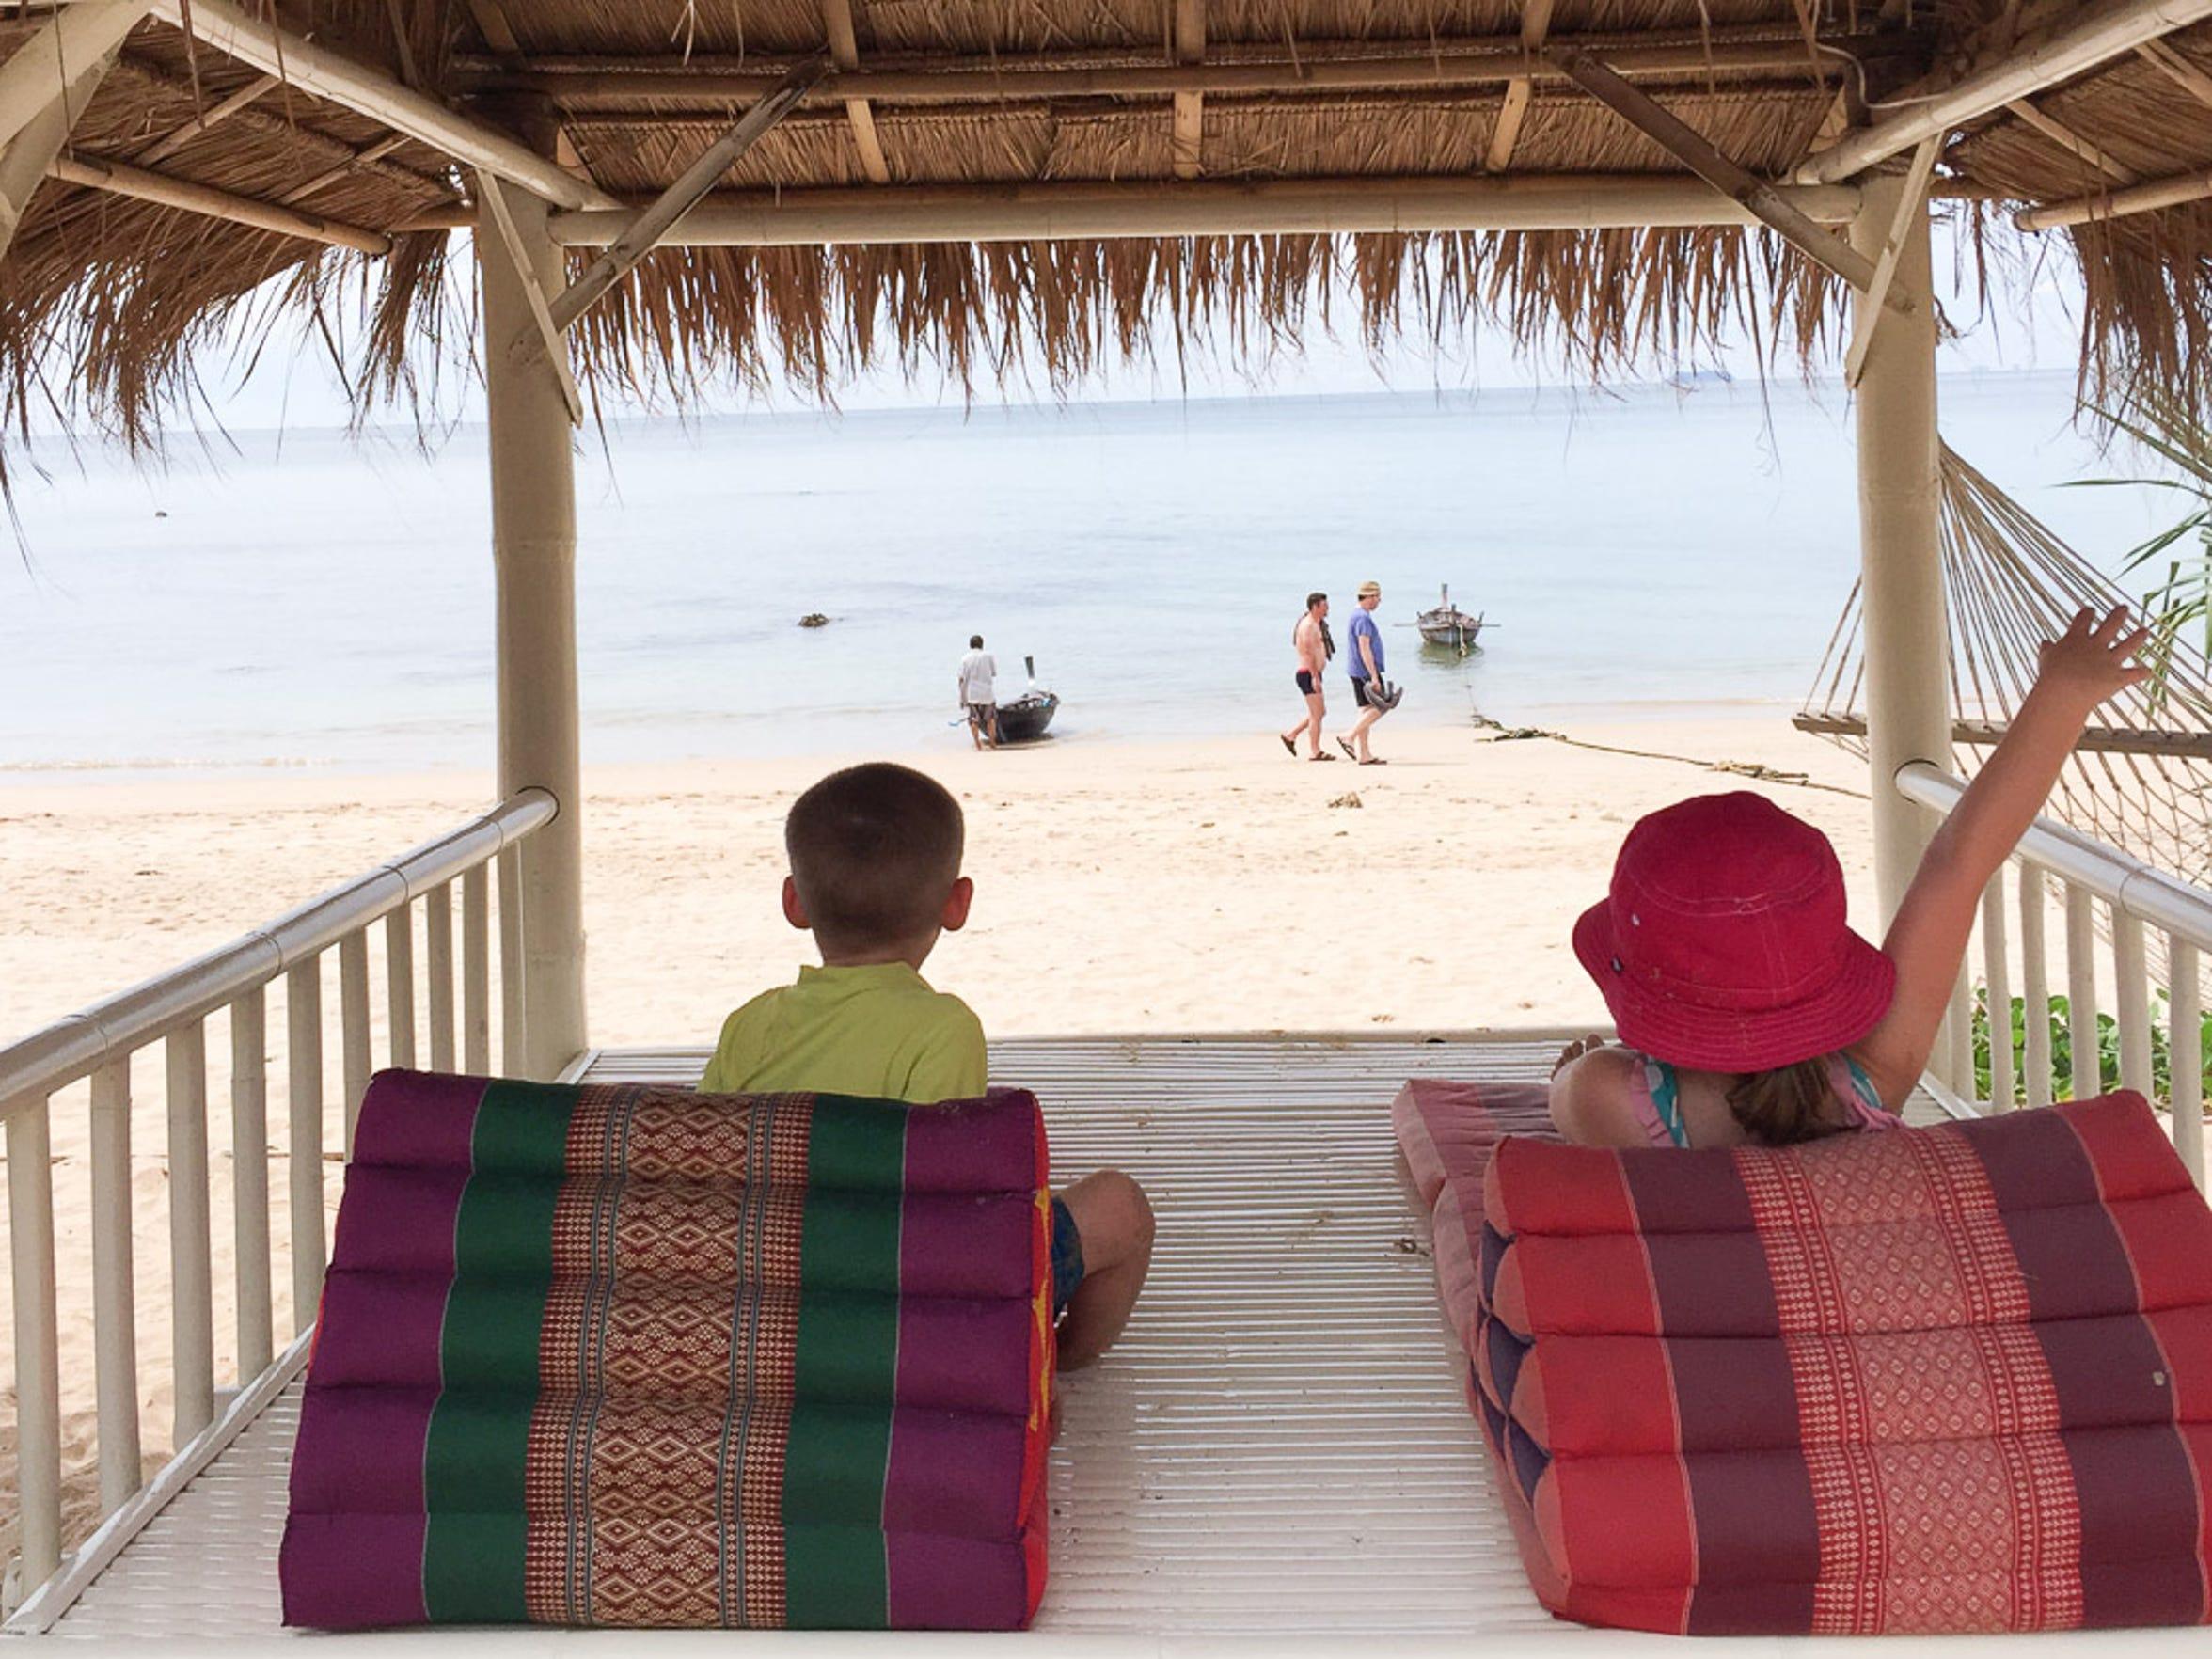 Harper and Walker Hughey adjust to island life in Ko